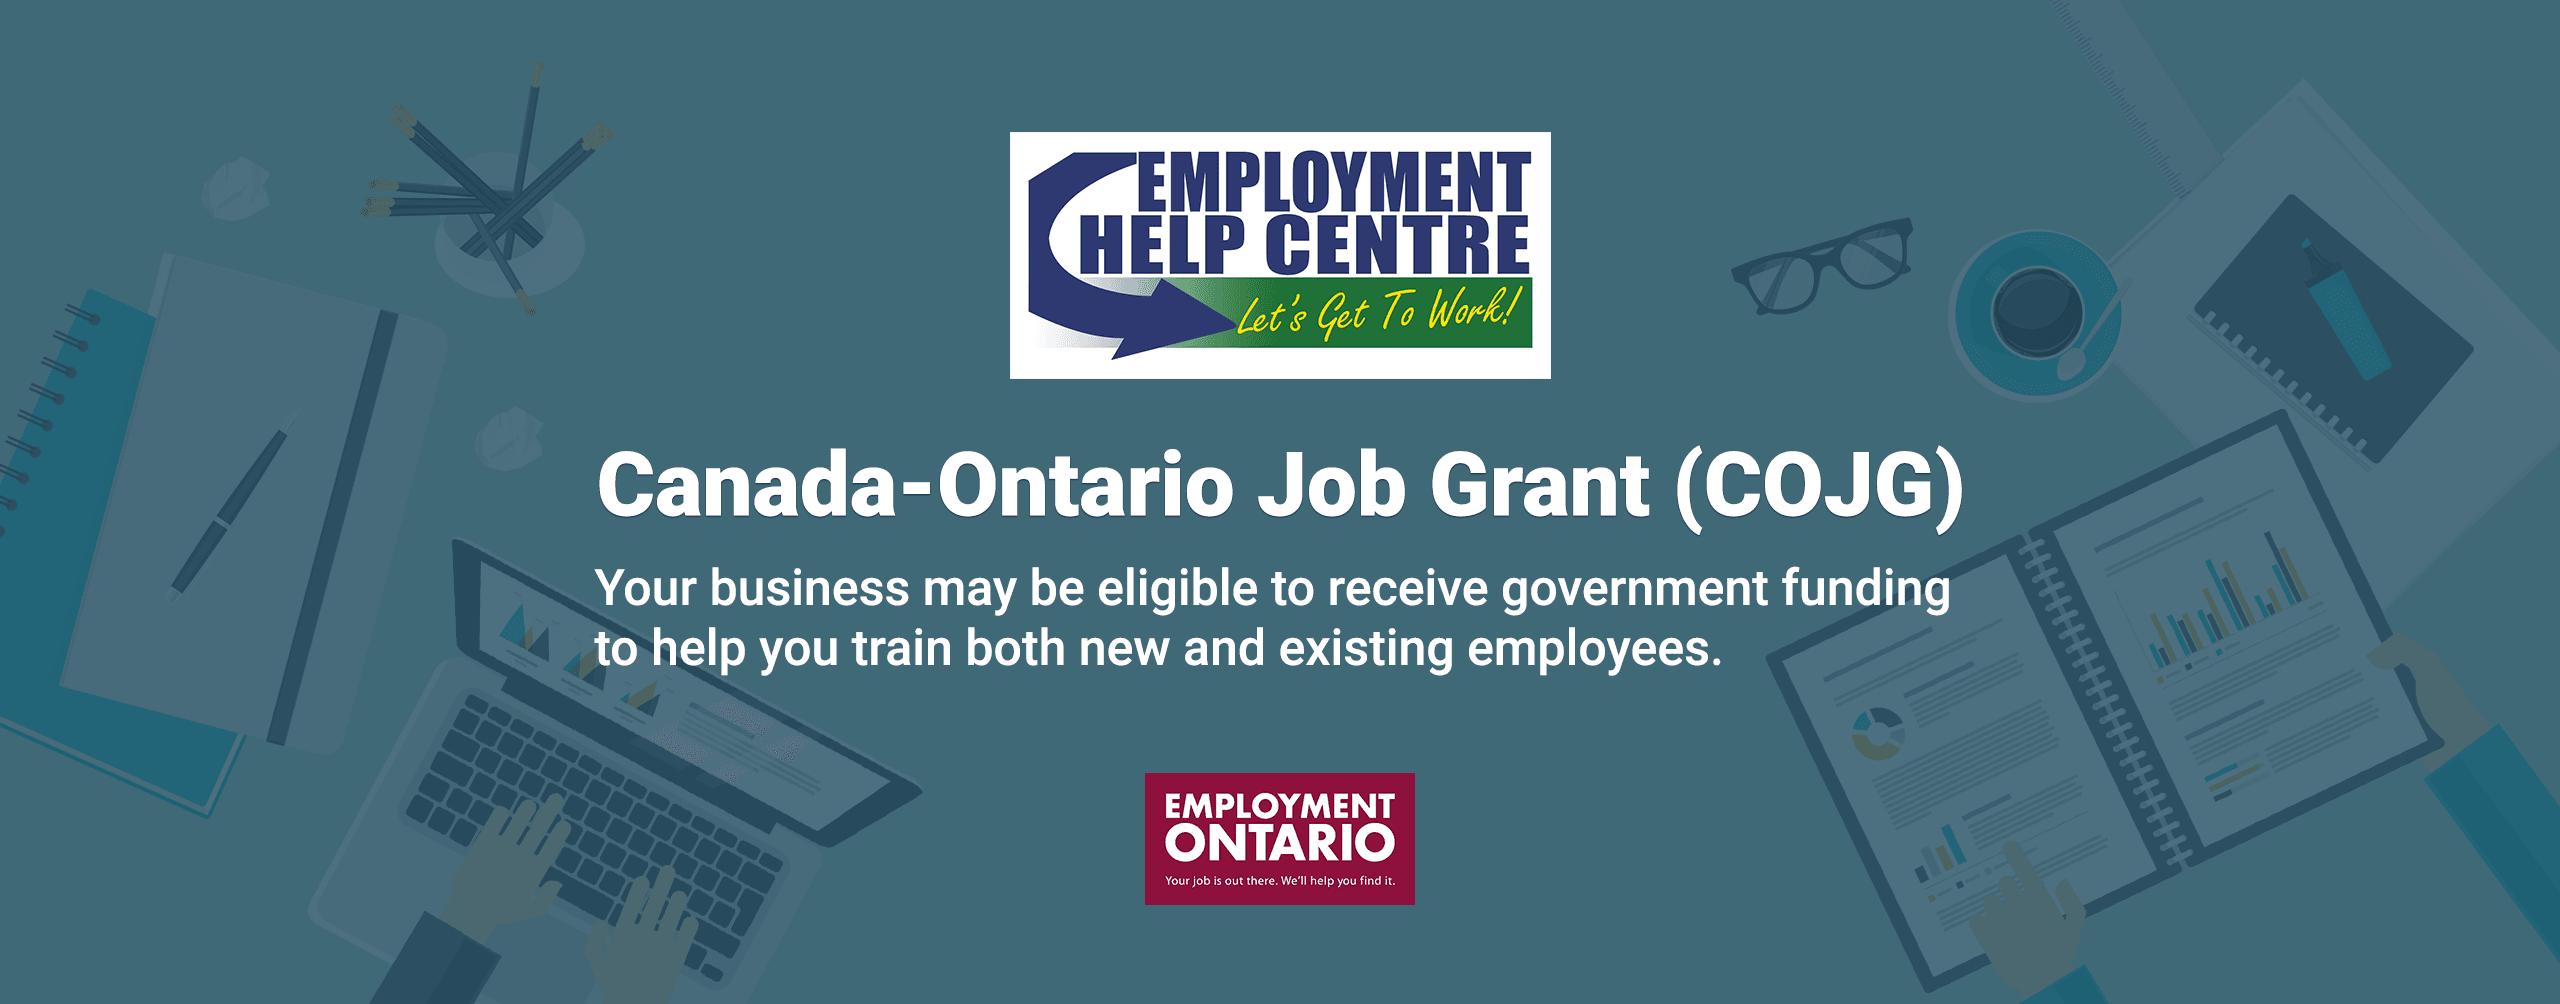 COJG - Canada-Ontario Job Grant - Train Your Employees